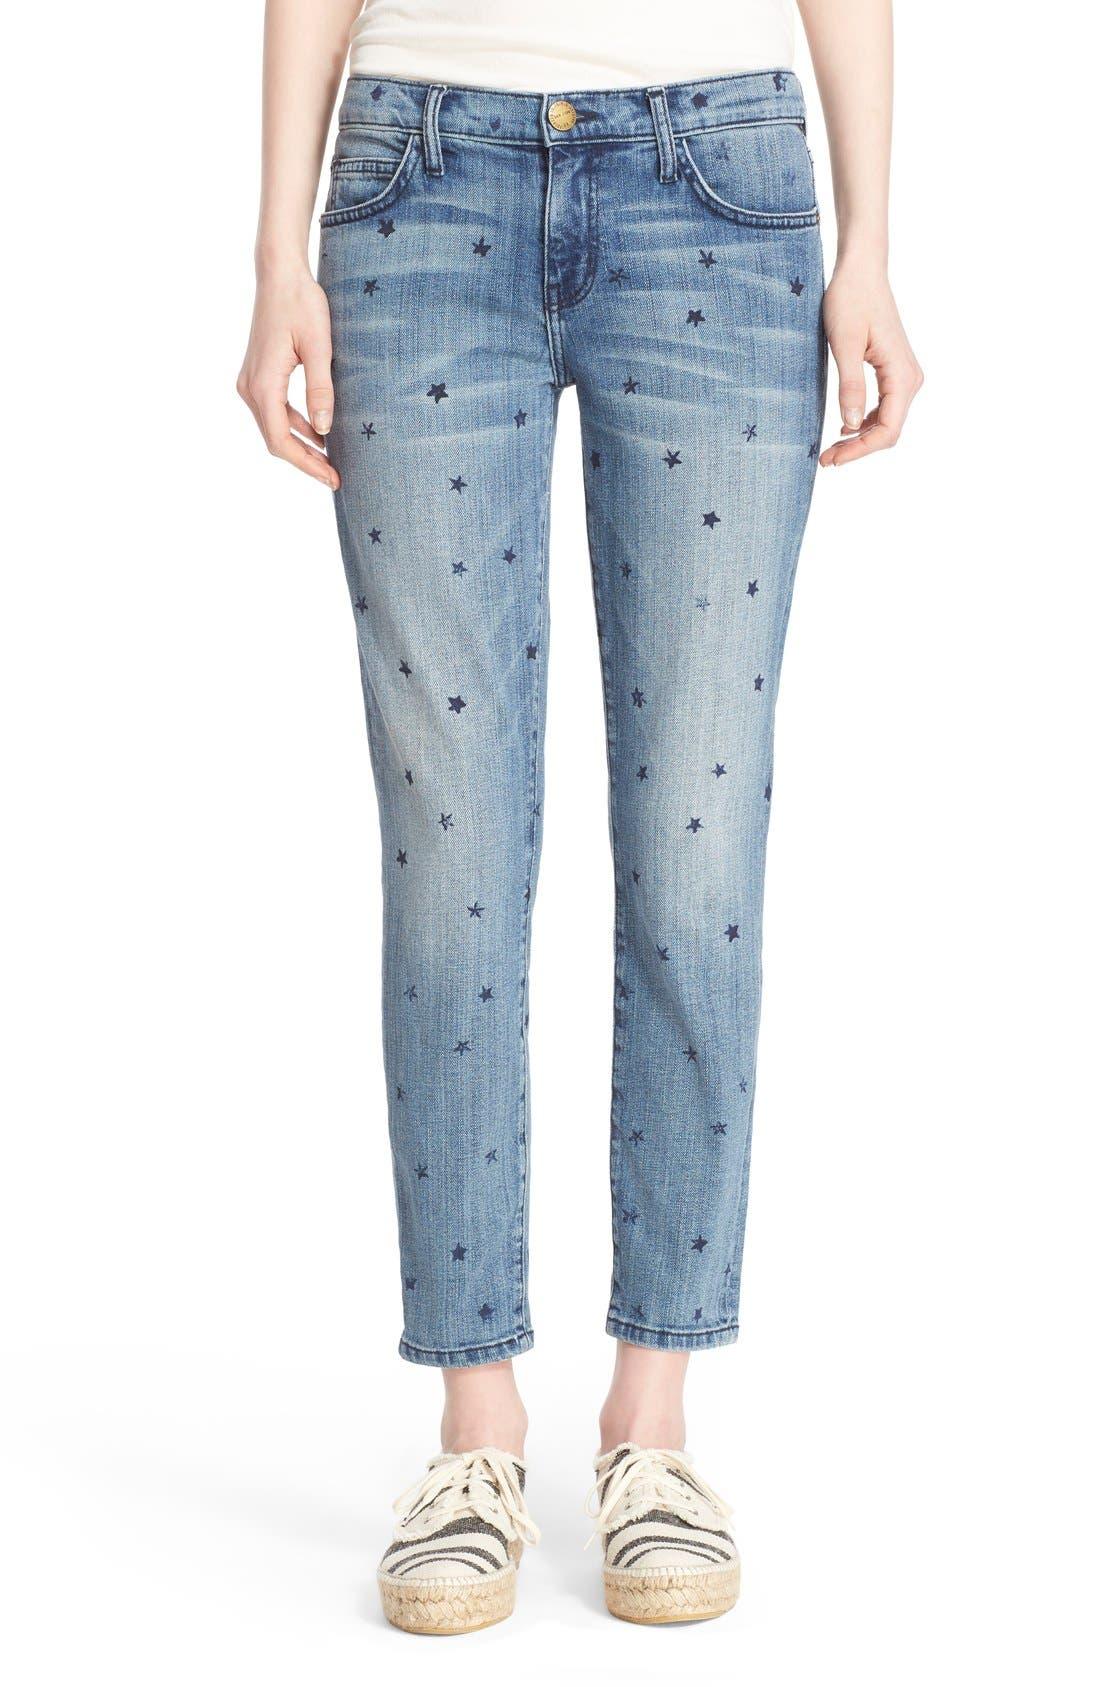 Main Image - Current/Elliott 'The Stiletto' Star Print Skinny Jeans (Revival with Mini Navy Stars)